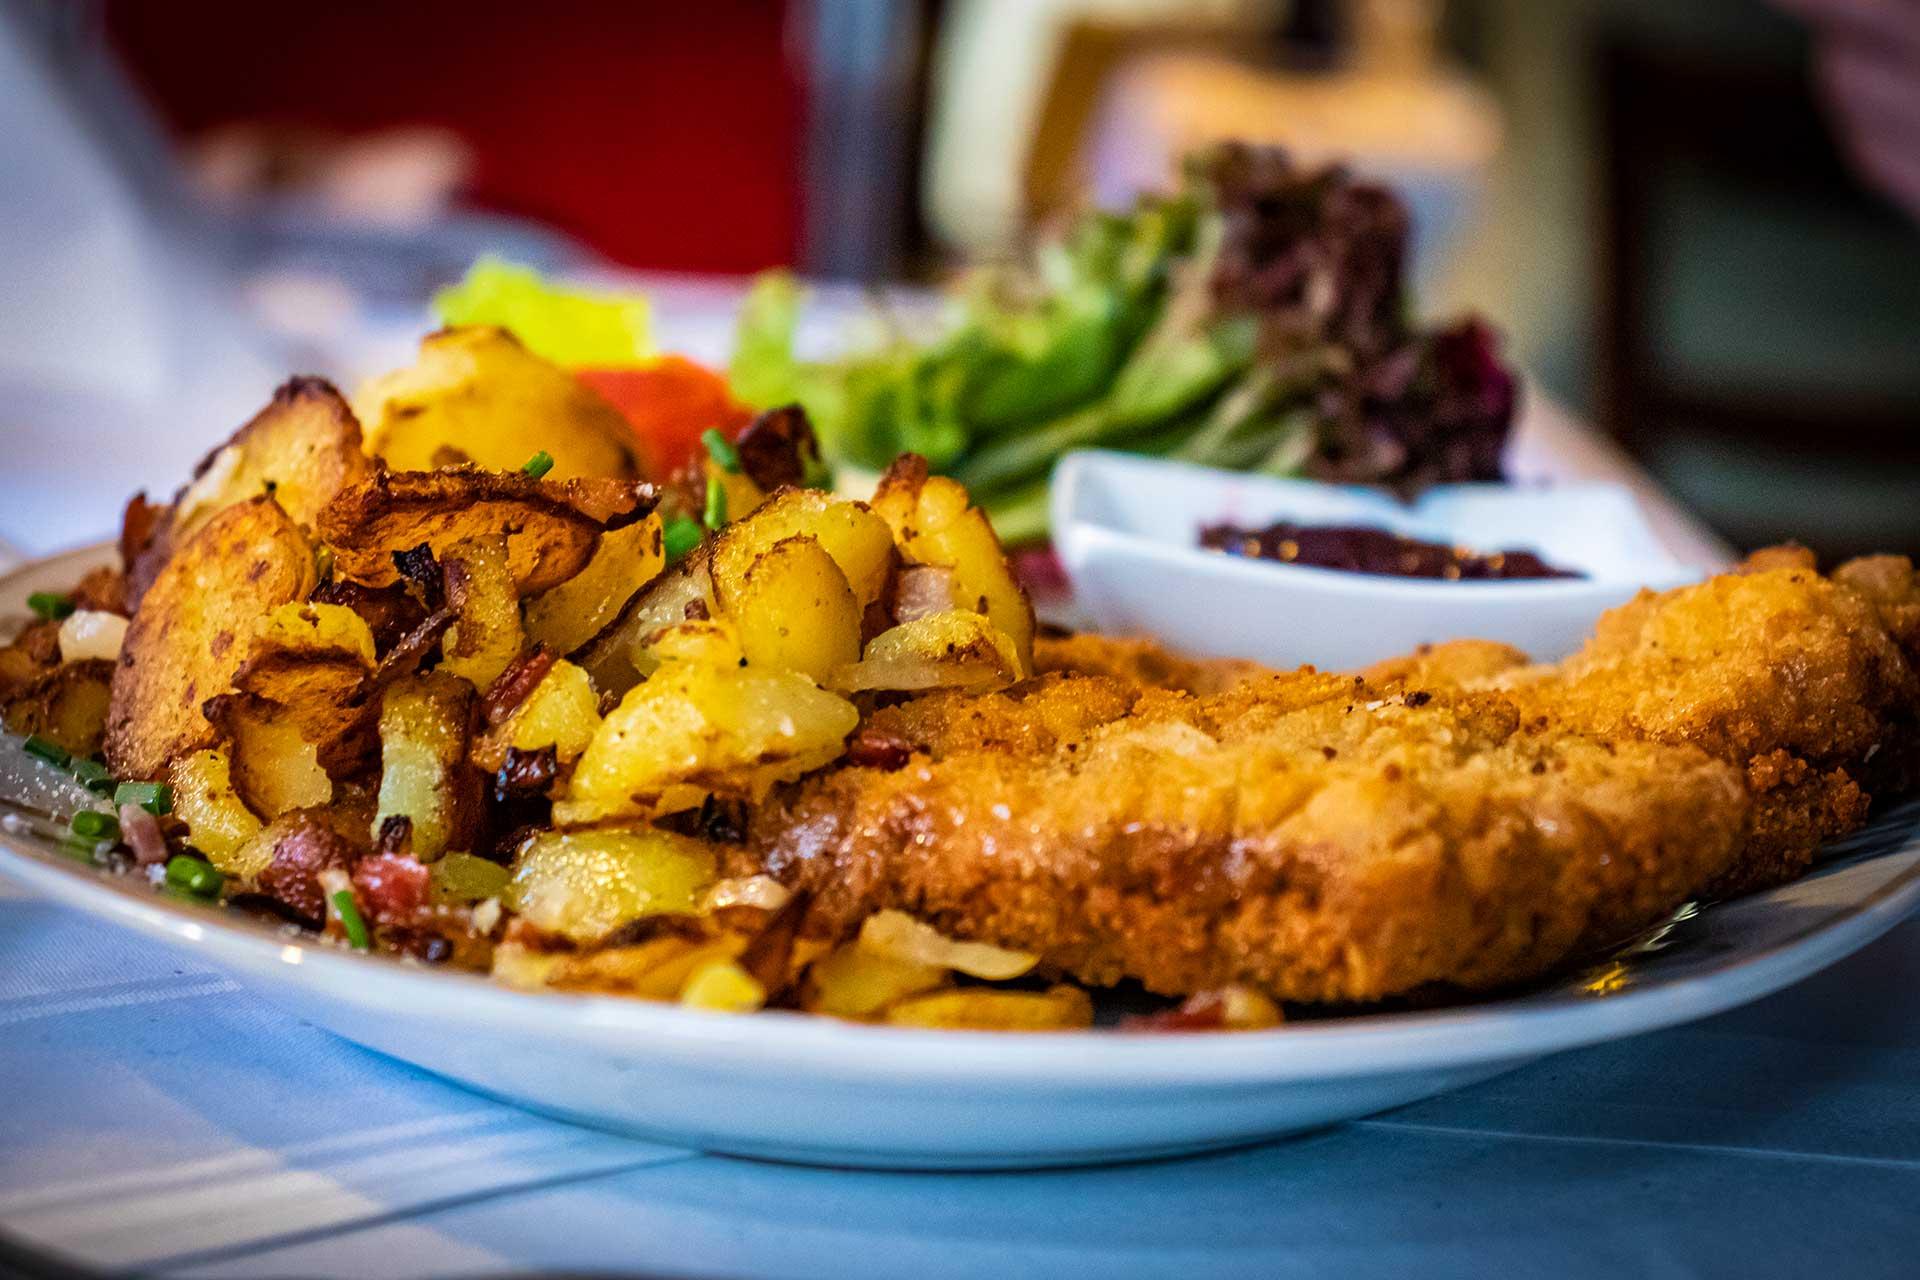 Speisen - Schnitzel - Restaurant Goldener Zwinger